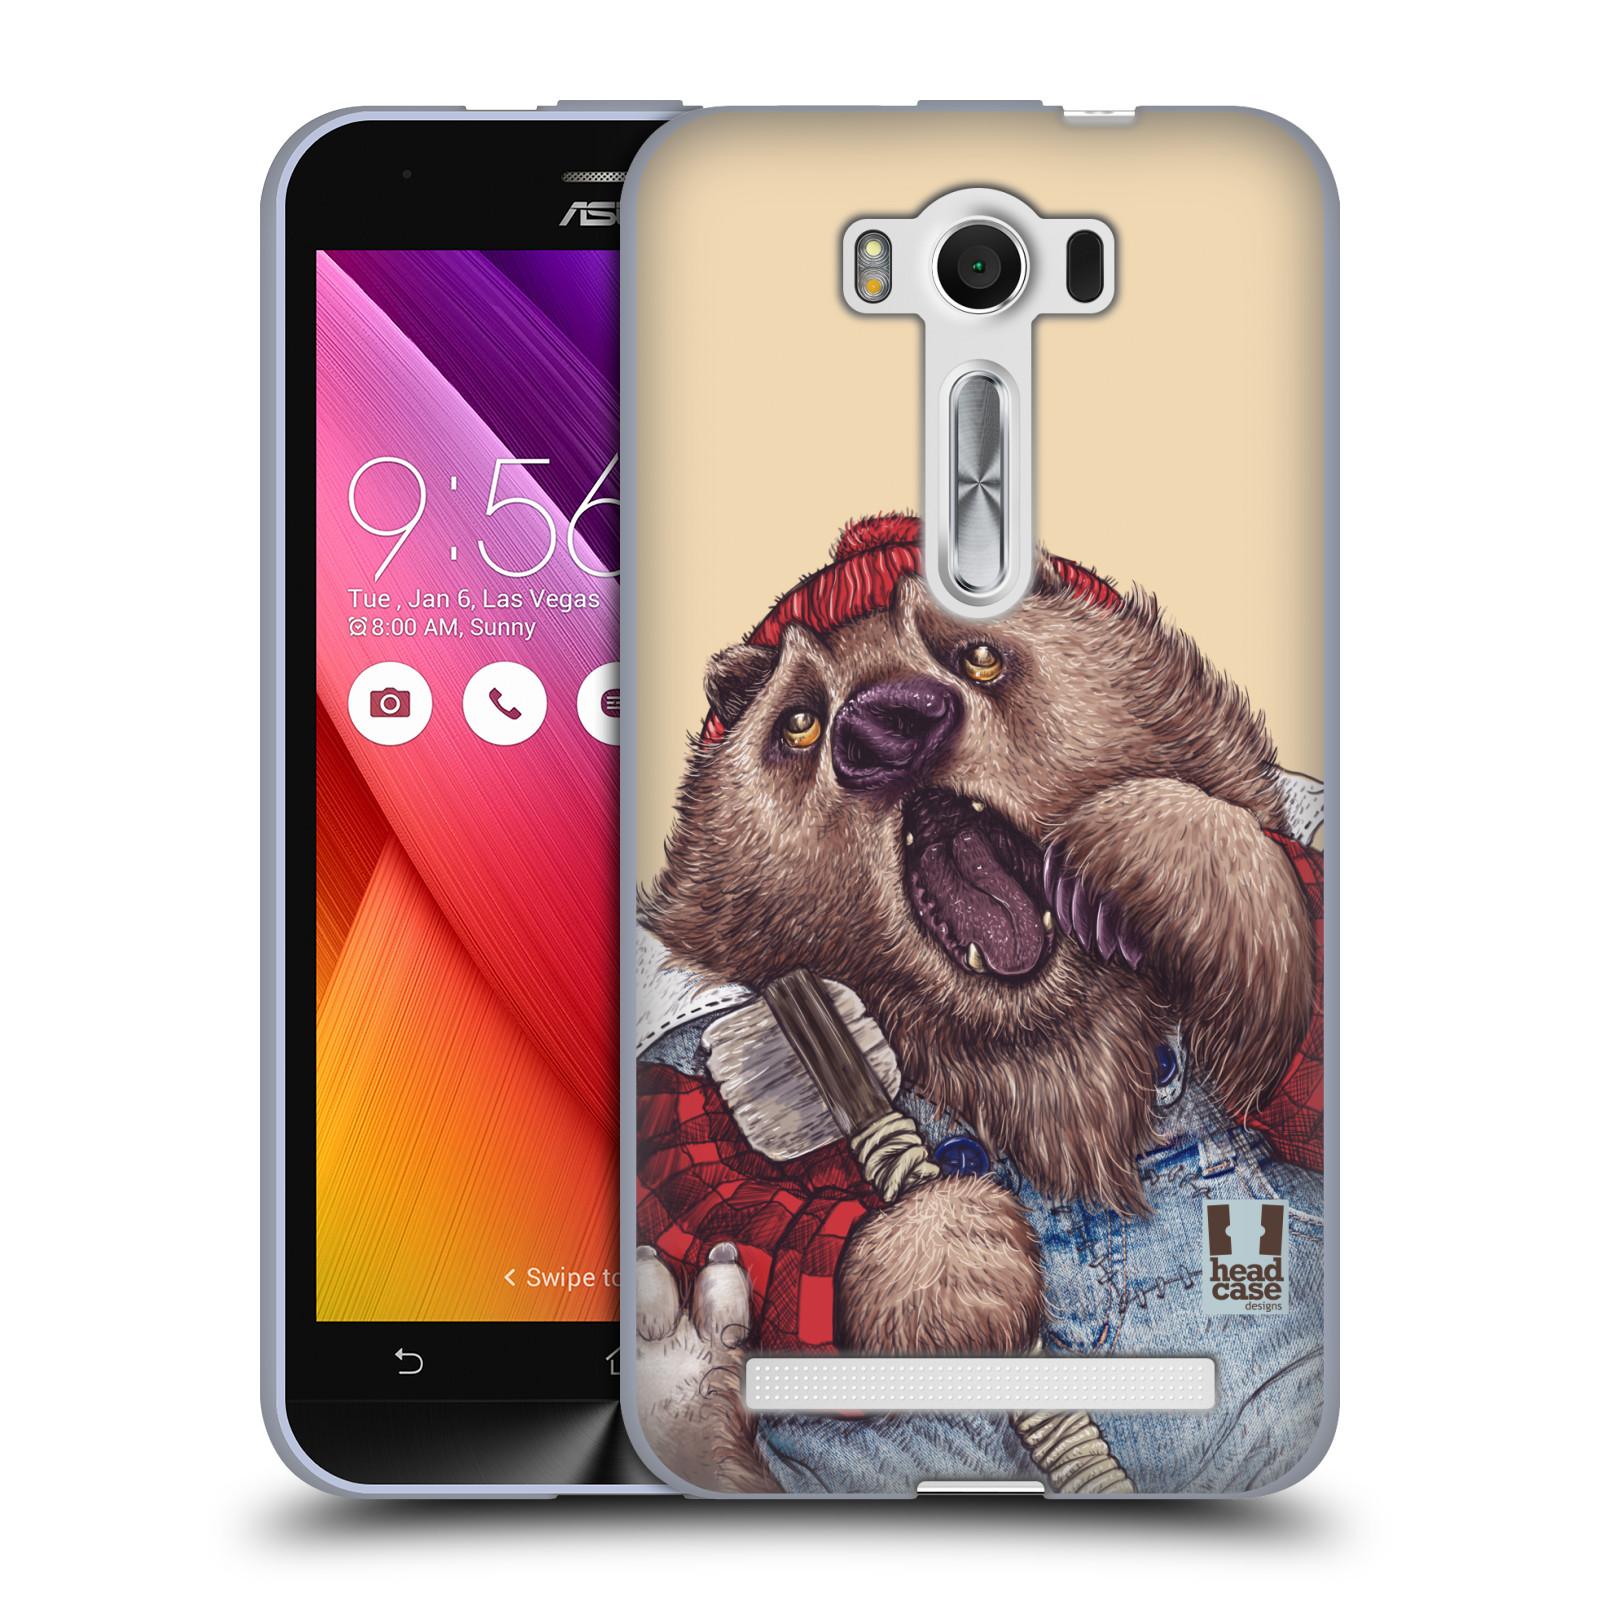 "HEAD CASE silikonový obal na mobil Asus Zenfone 2 LASER (ZE500KL s 5"" displejem) vzor Kreslená zvířátka medvěd"